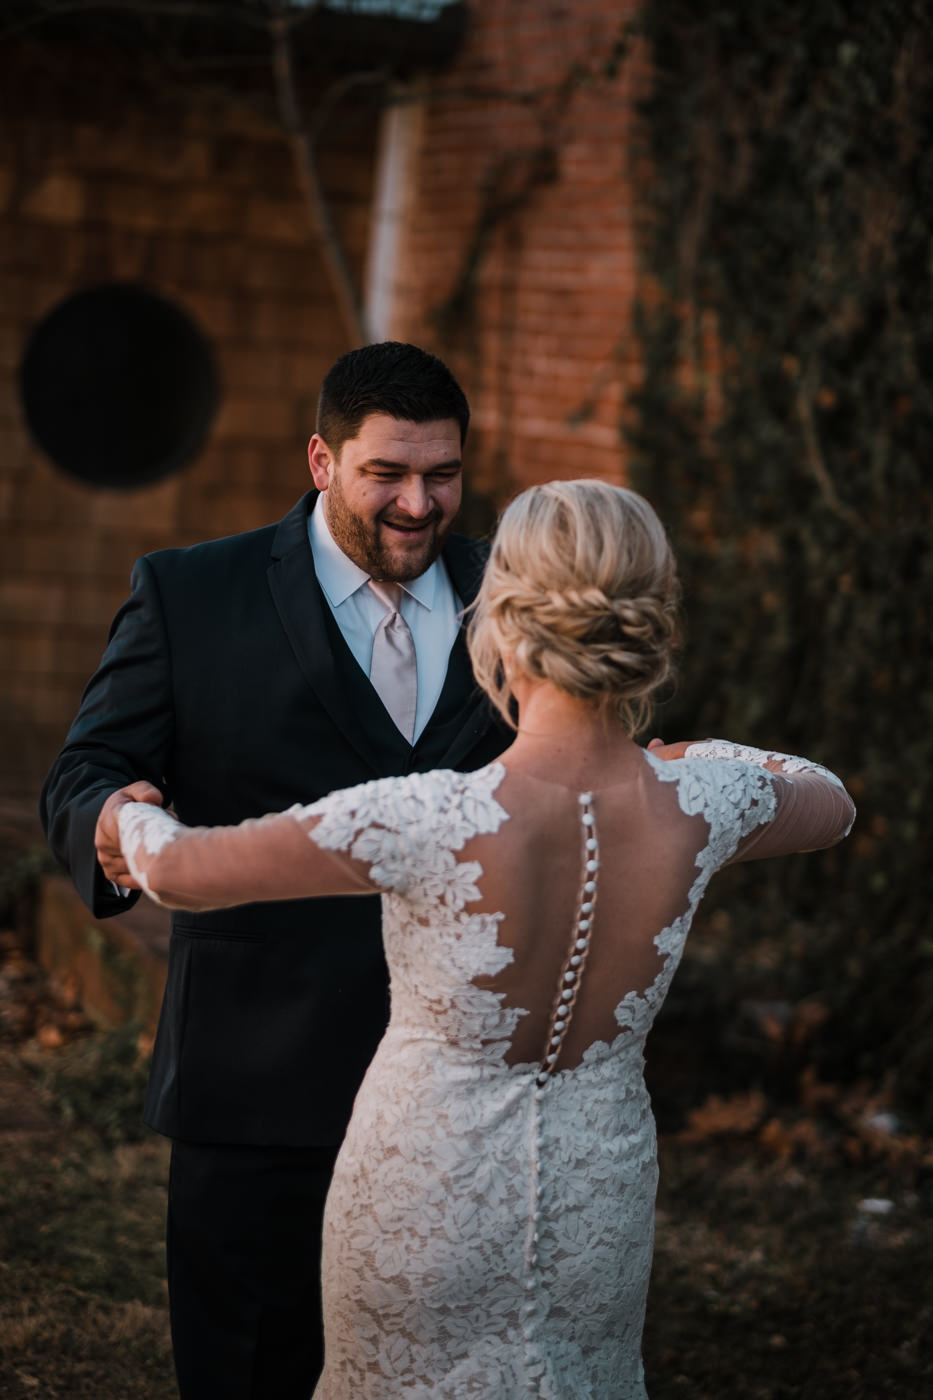 ravington.wedding.northwestarkansas.mileswittboyer-14.jpg